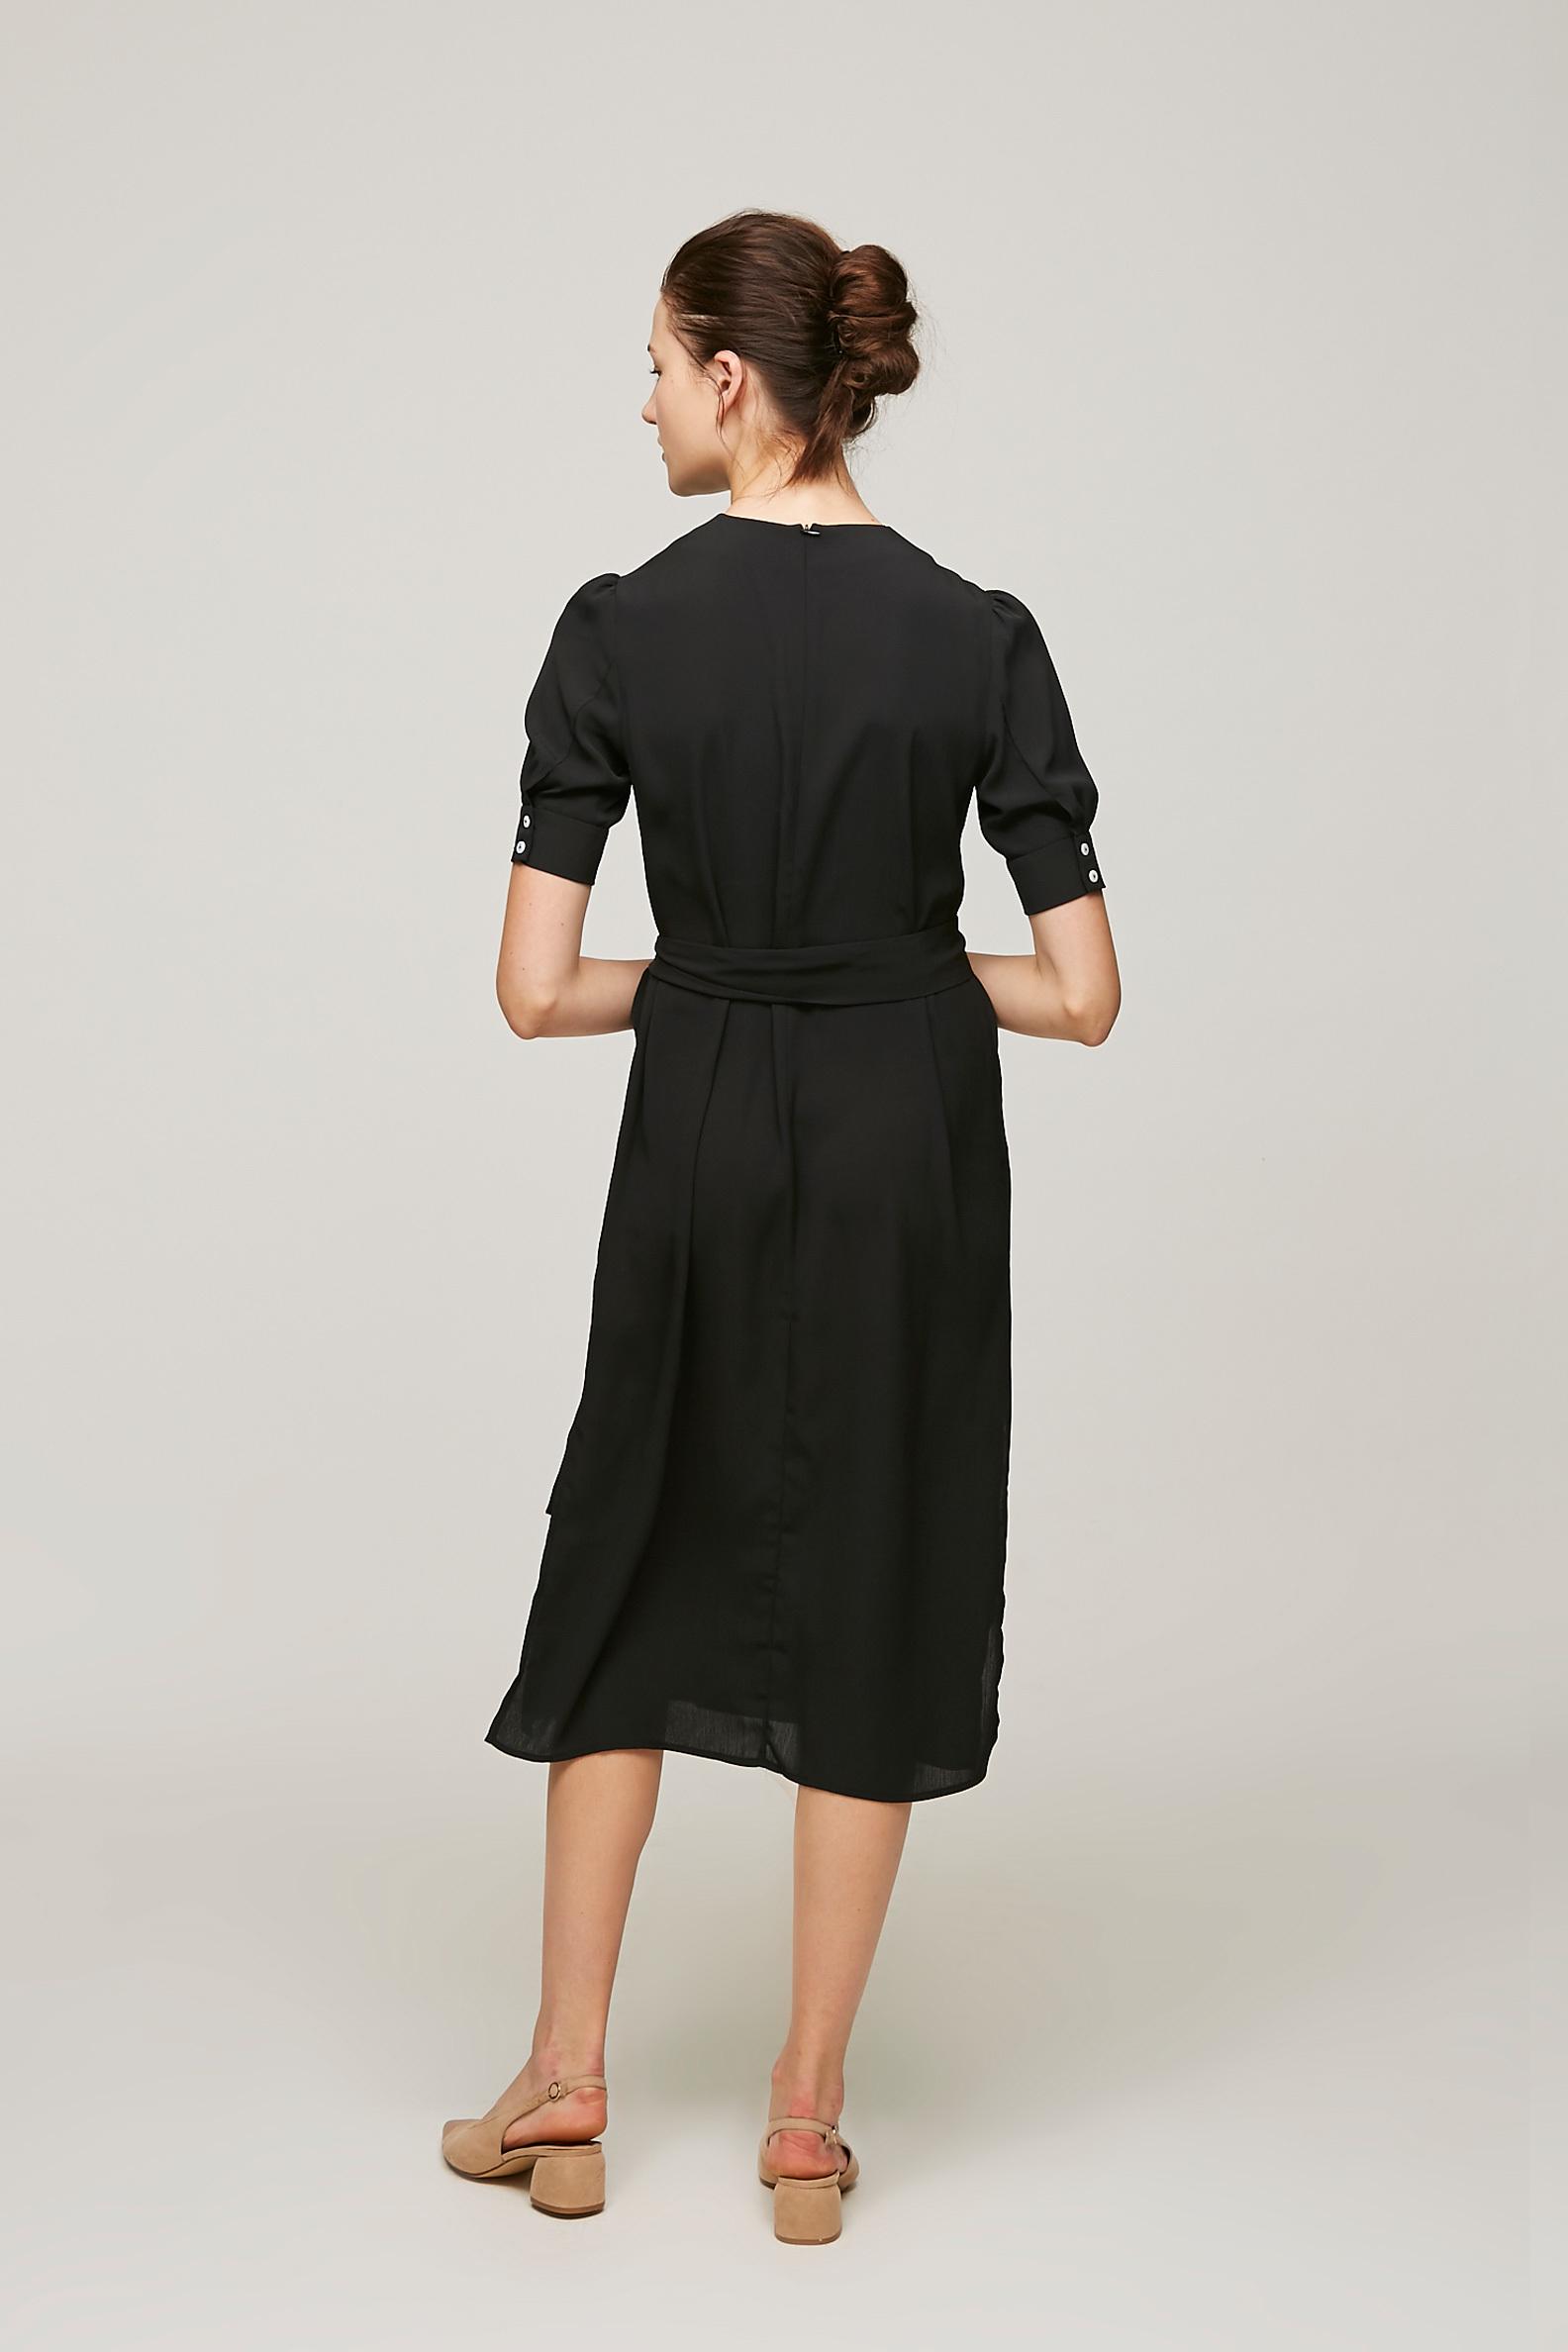 Cuff Sleeve Shift Dress